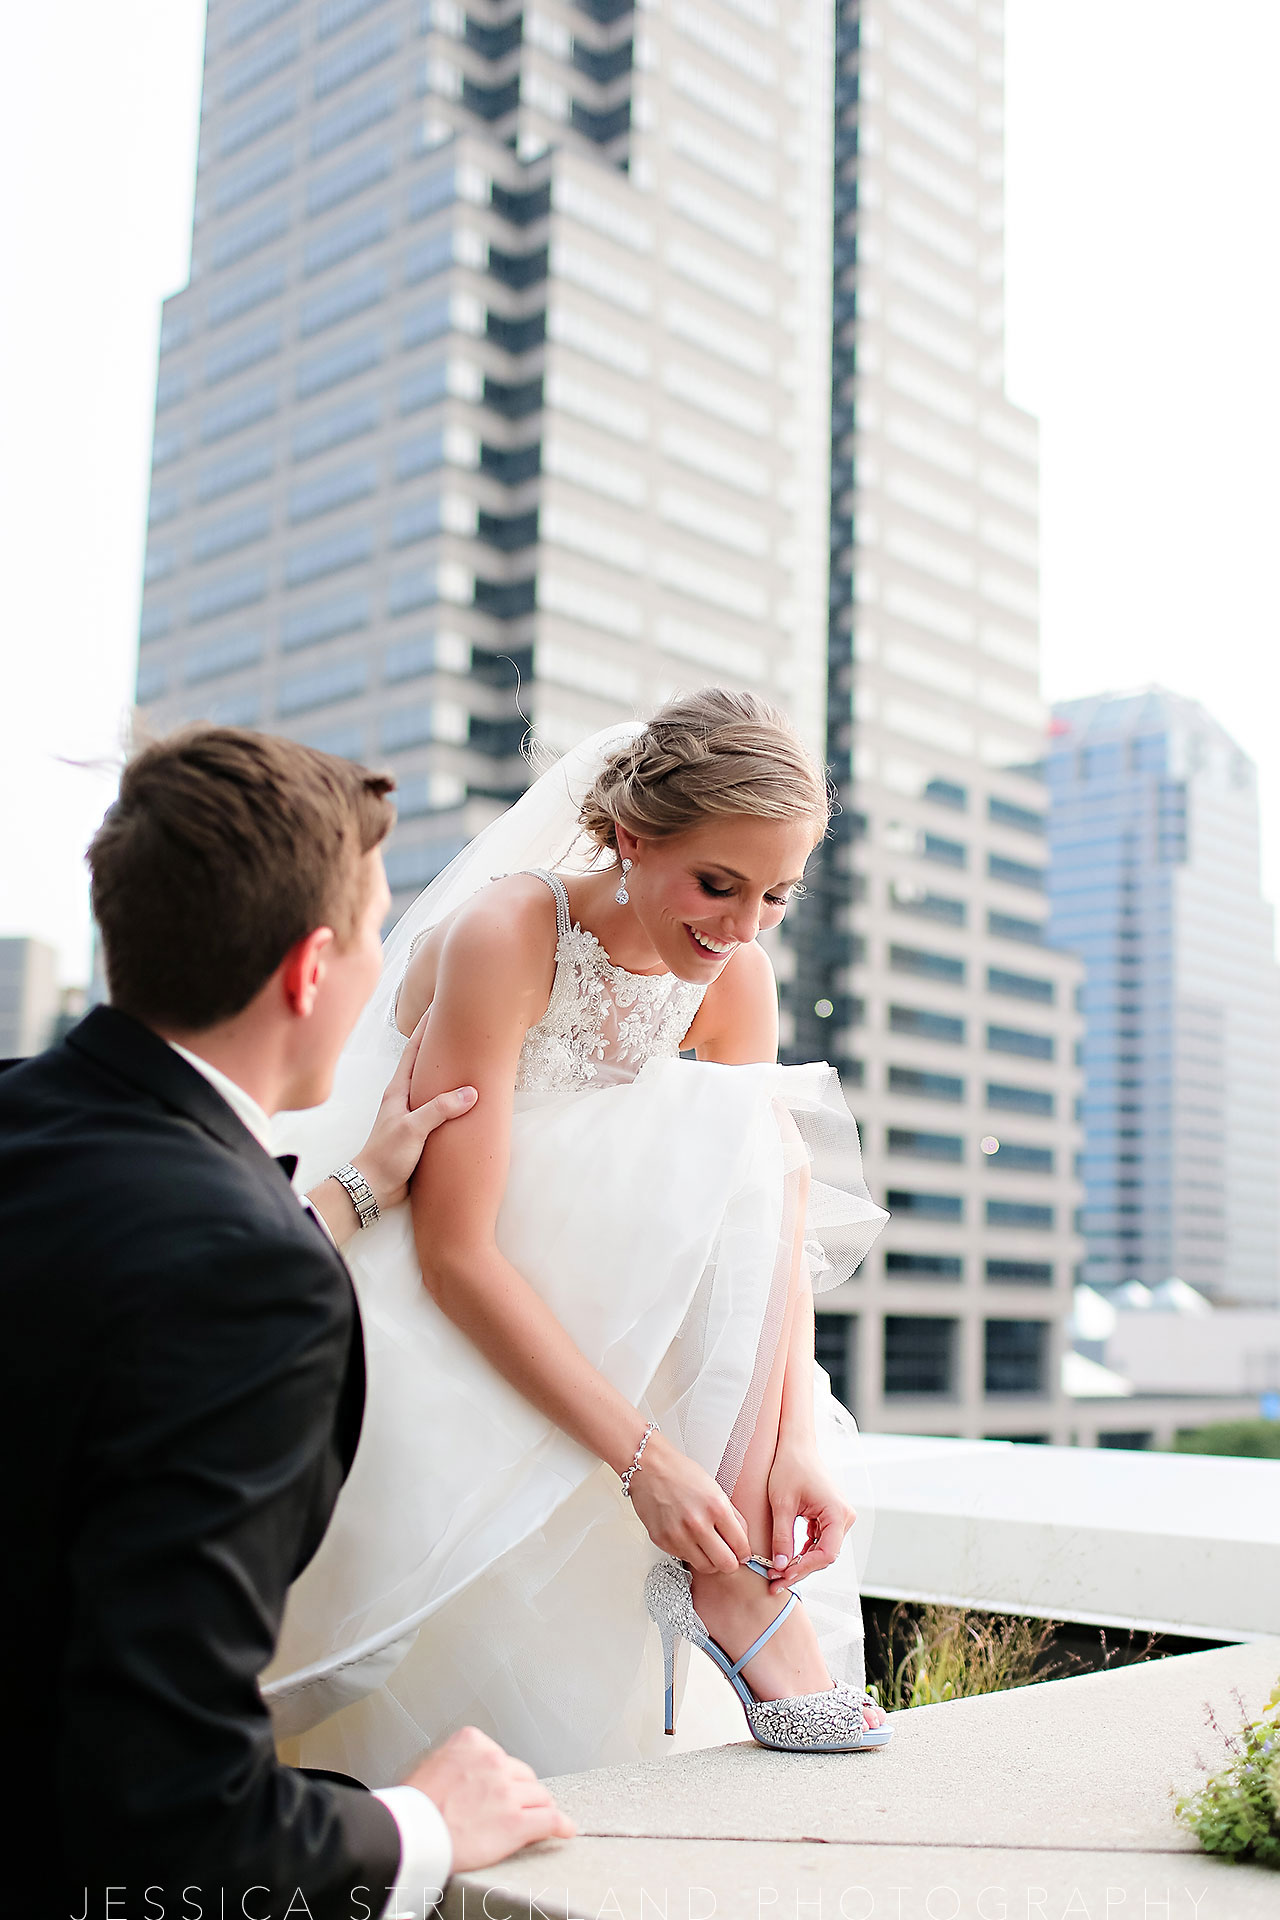 Serra Alex Regions Tower Indianapolis Wedding 248 watermarked